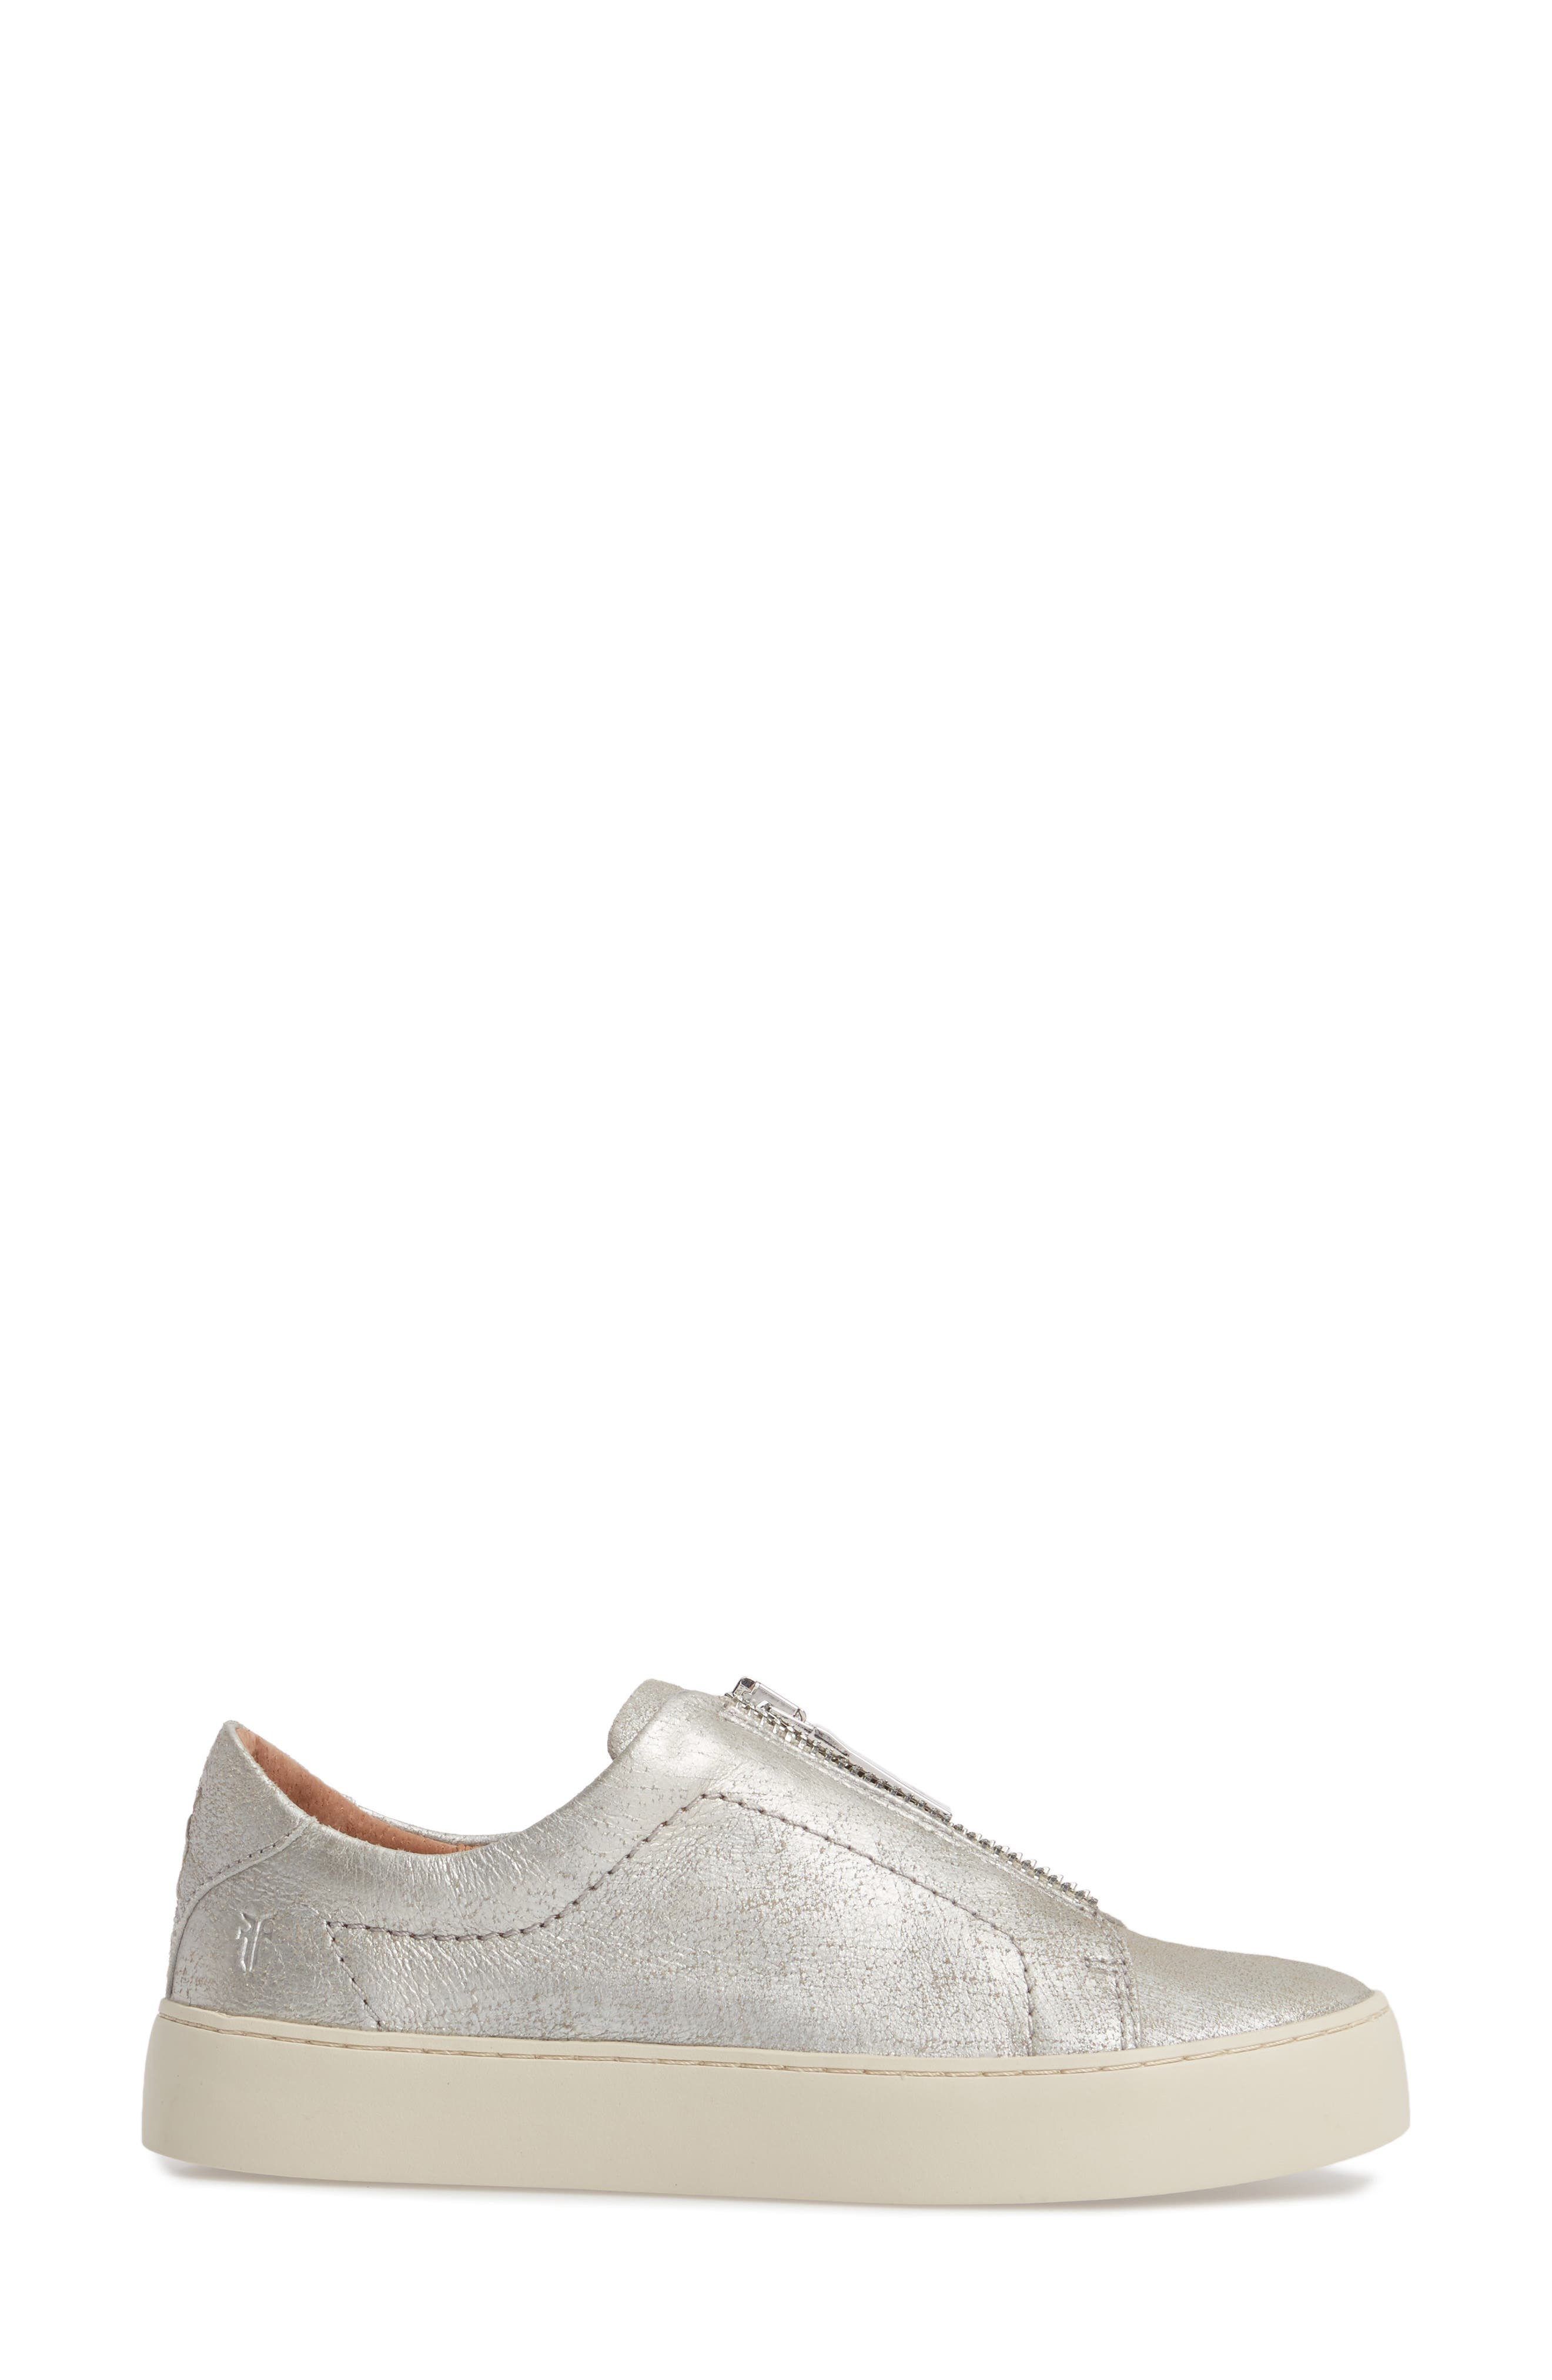 Lena Zip Sneaker,                             Alternate thumbnail 3, color,                             040